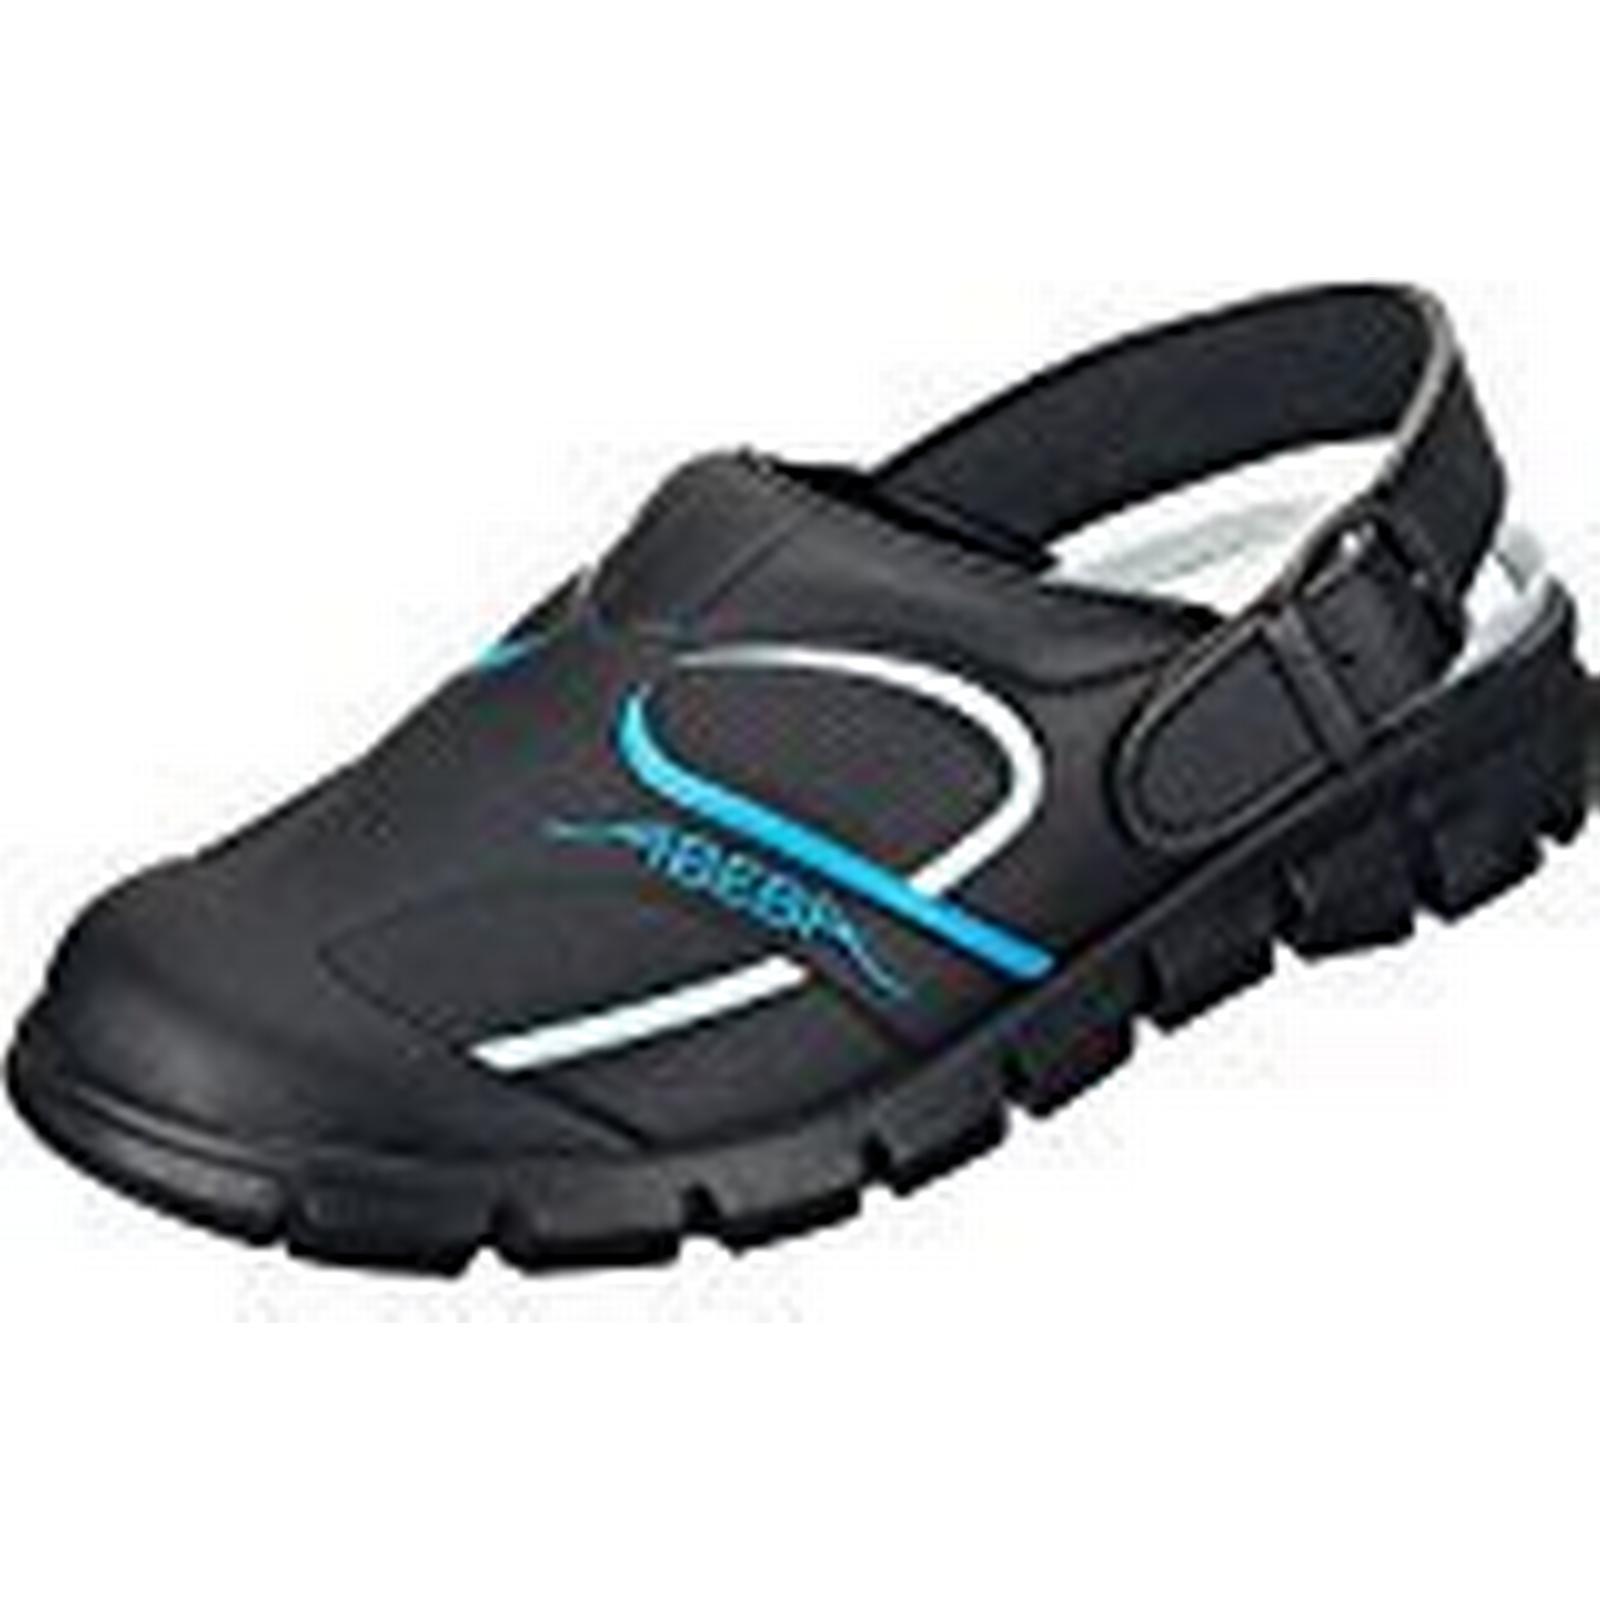 Abeba 7331-39 Shoe, Dynamic Occupational-Clog Shoe, 7331-39 Size 6, Black/Blue b6b61a